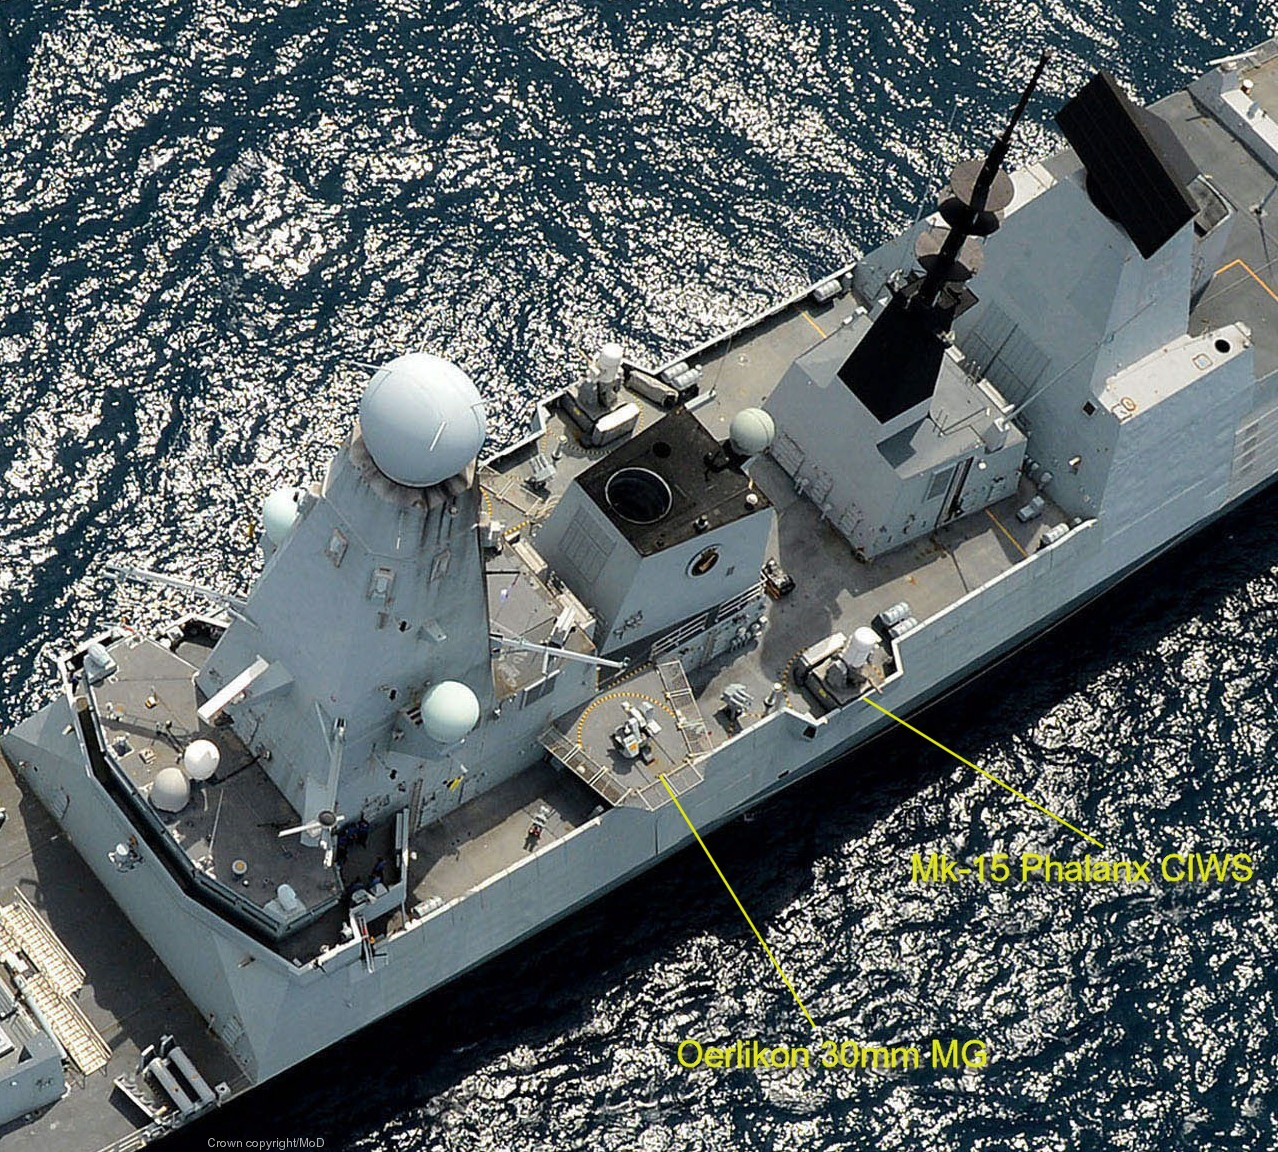 type 45 daring class destroyer oerlikon 30mm machine gun mk-15 phalanx ciws